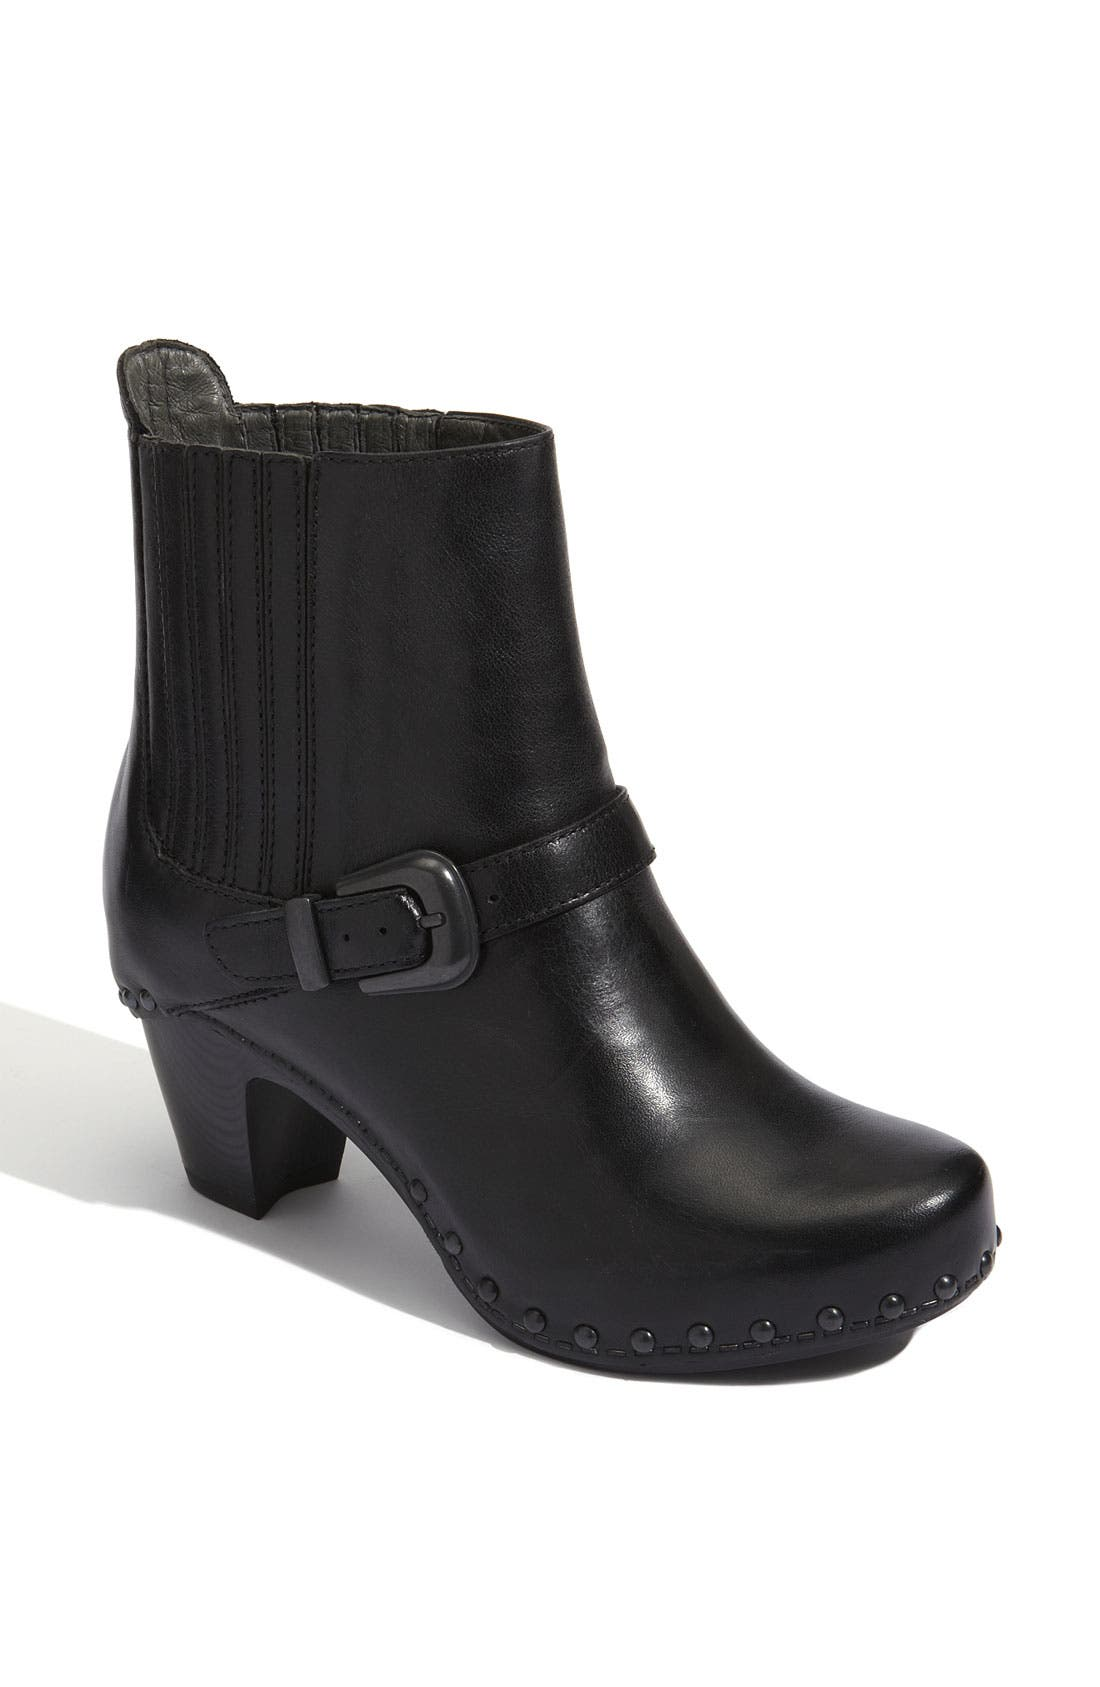 Main Image - Dansko 'Rhianna' Boot